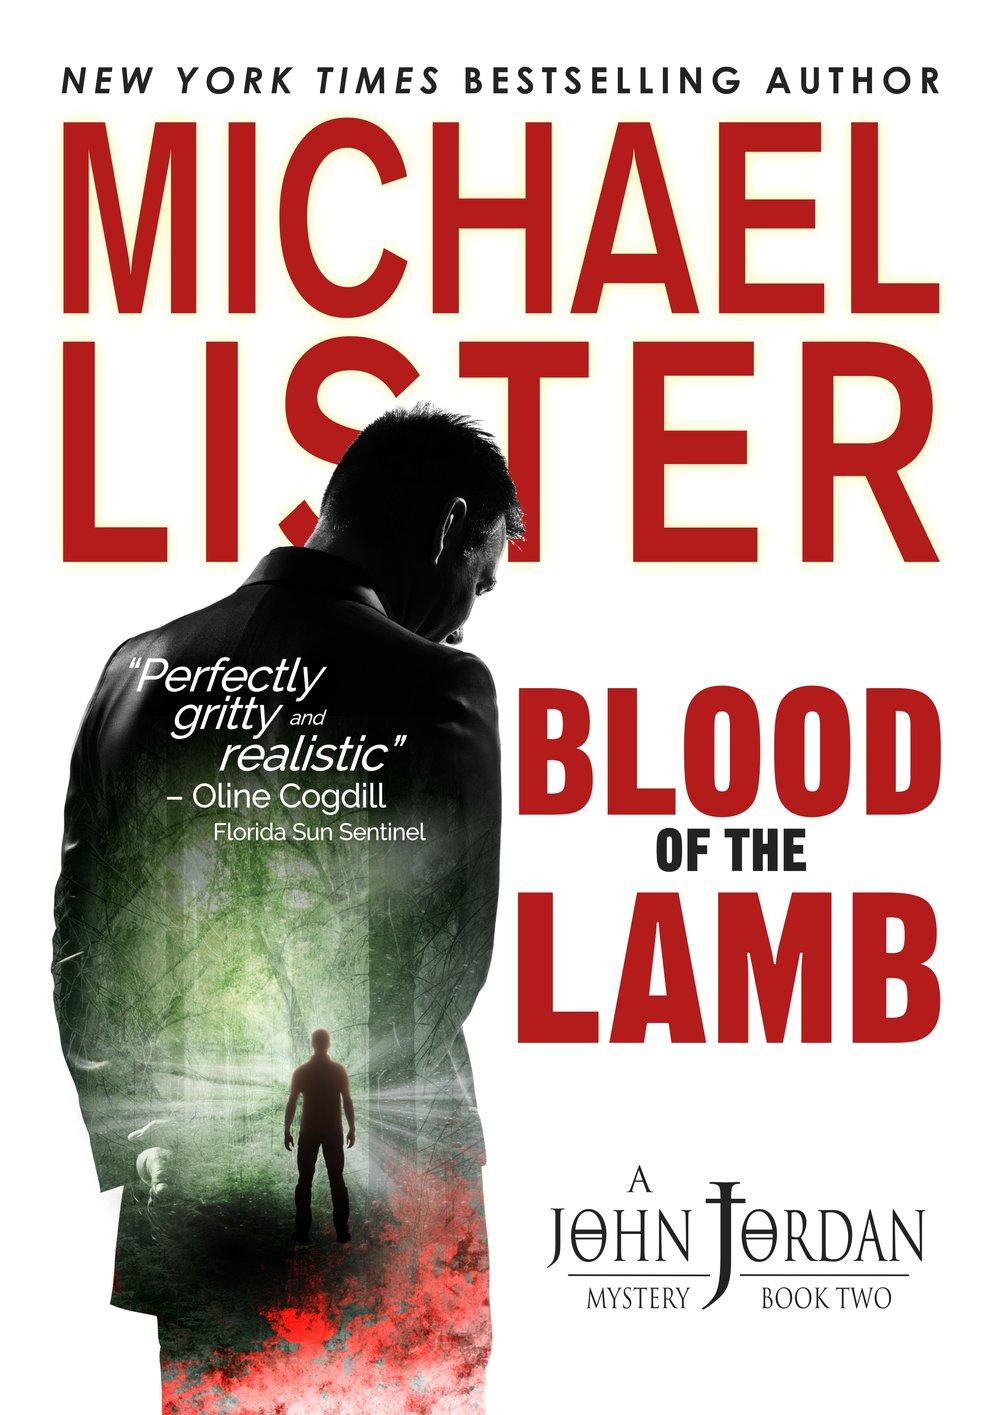 BloodLamb1.jpg